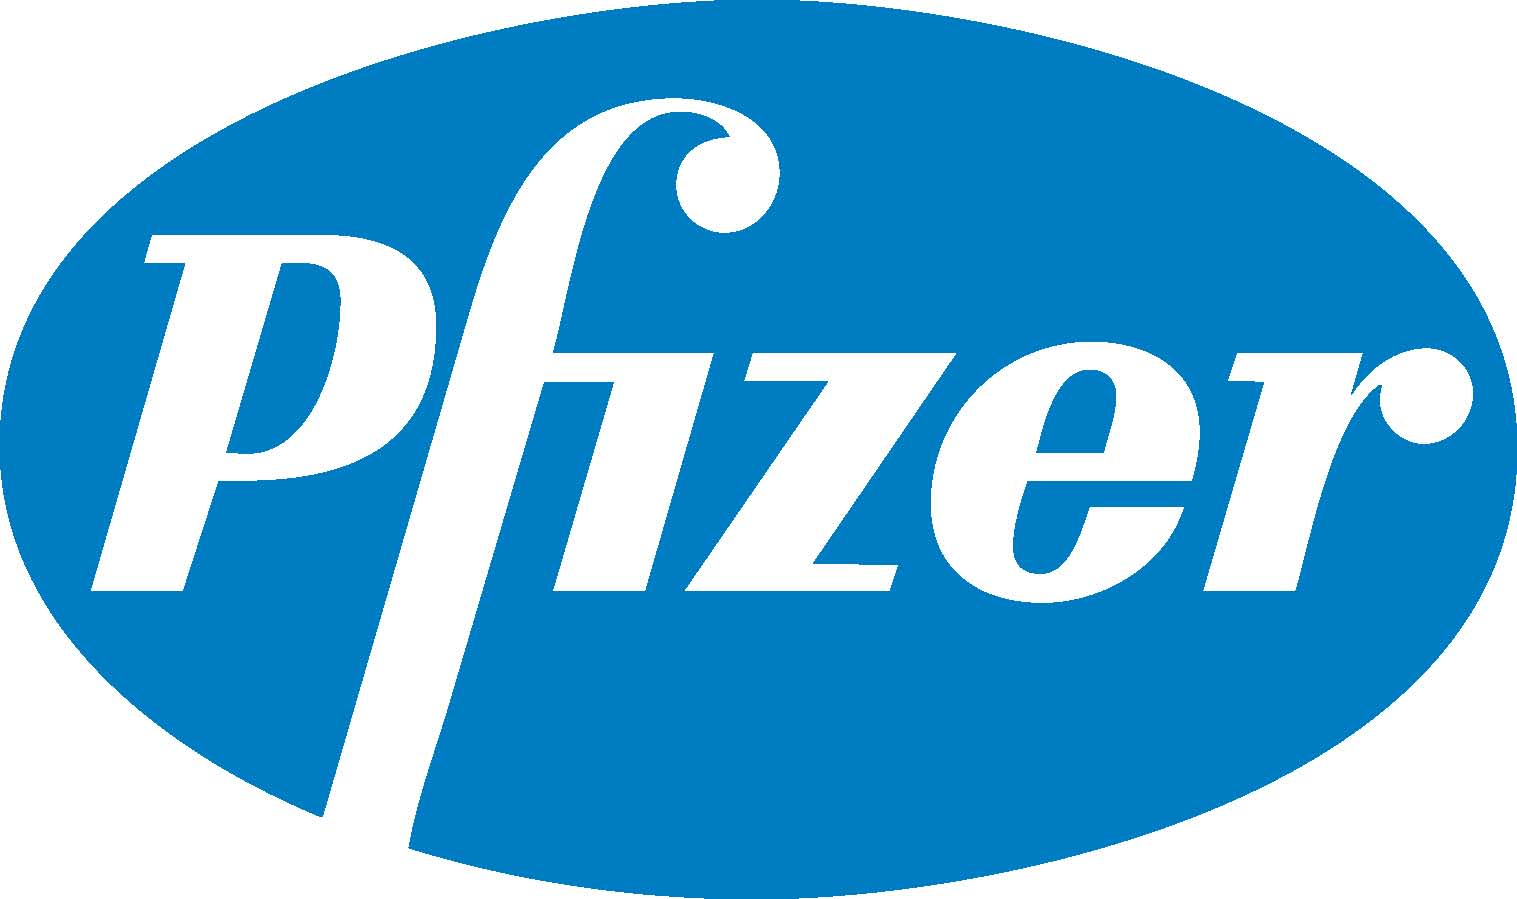 pfizer_logo_1.jpg